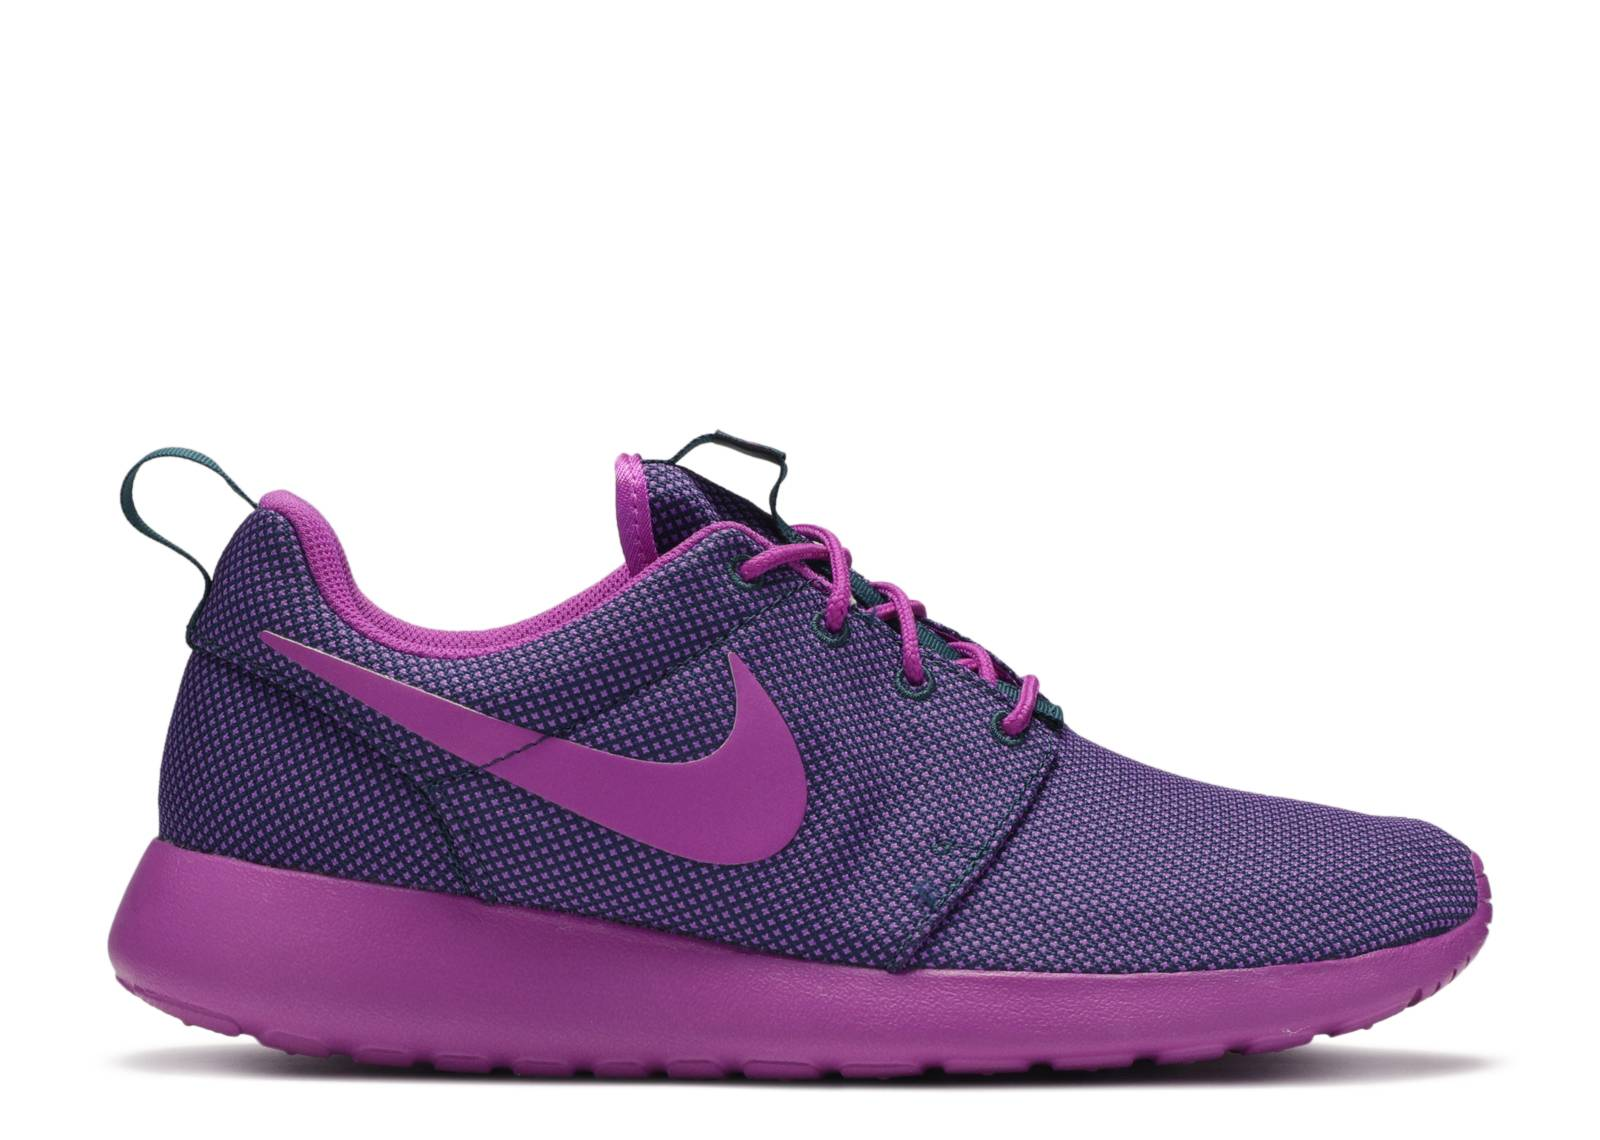 nike roshe run purple Remise